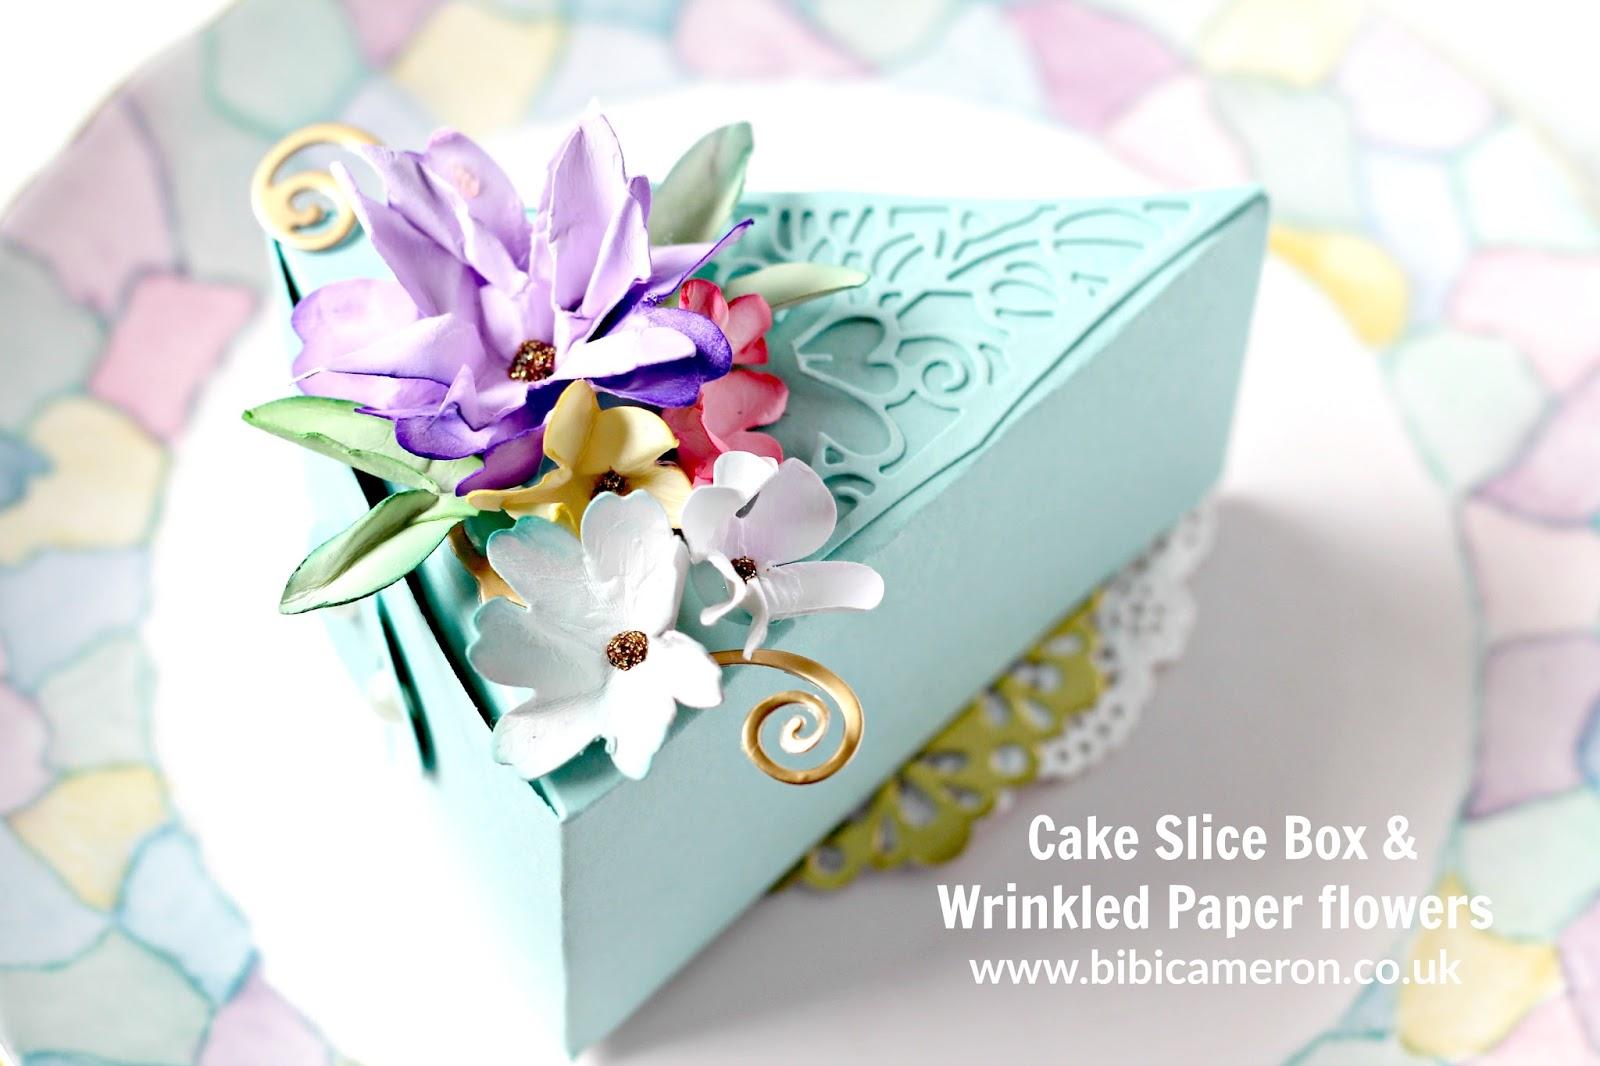 Cake Slice  Box & Wrinkled Paper flowers | SIP Challenge 93